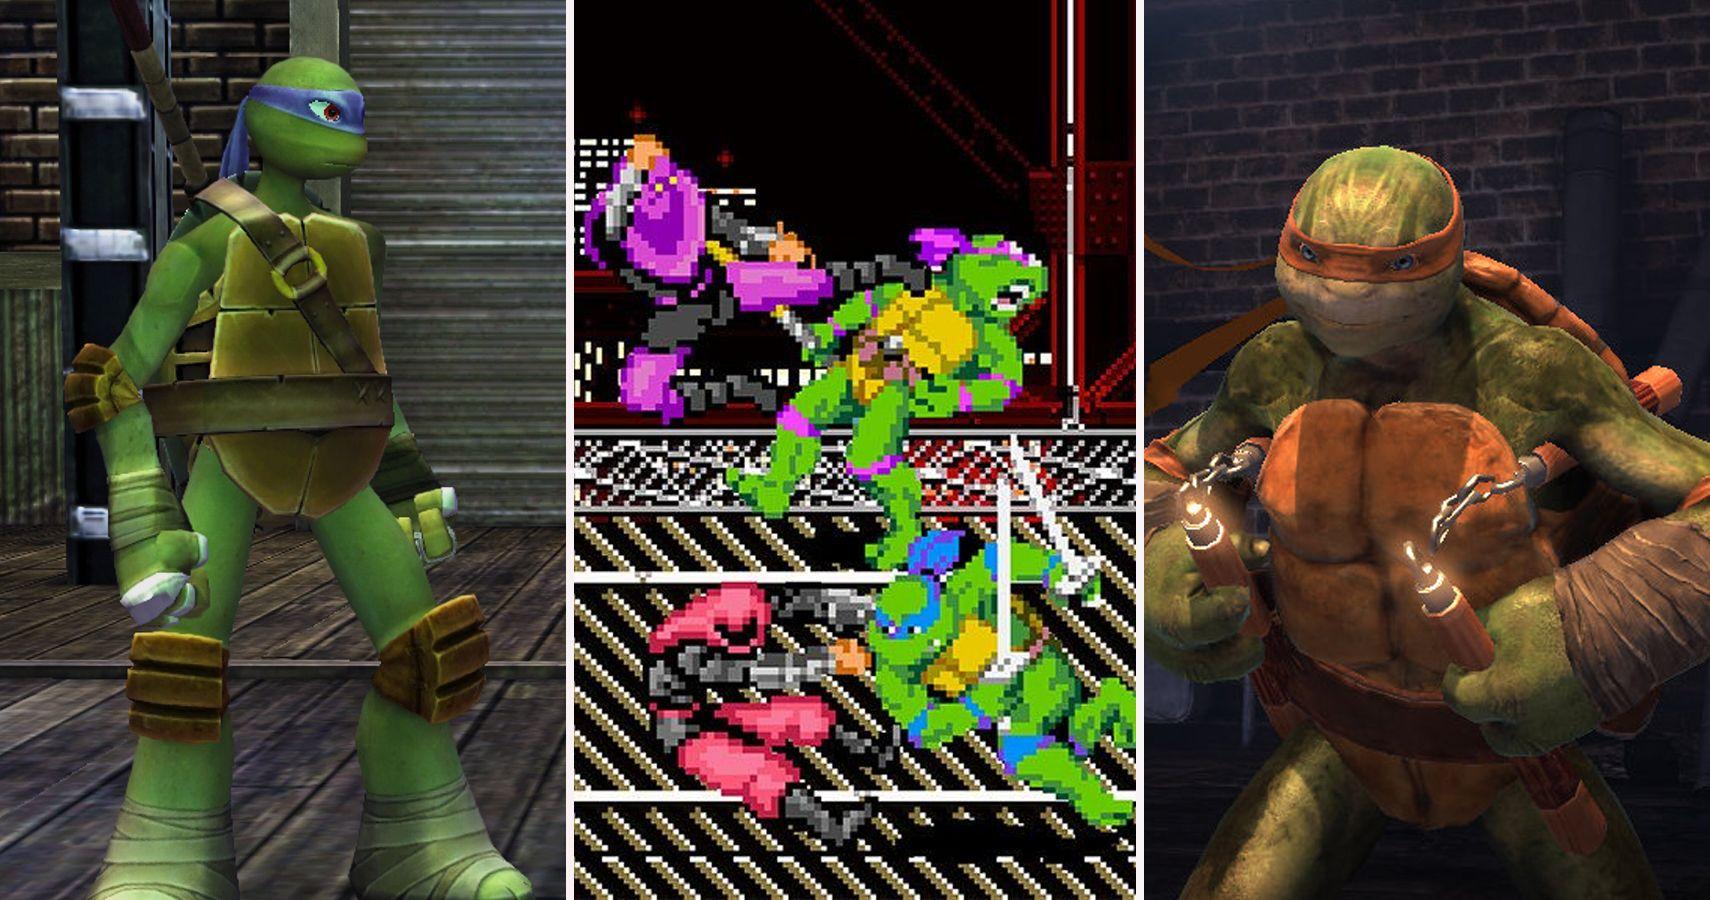 The 11 Weirdest Teenage Mutant Ninja Turtles Games And The 9 Best